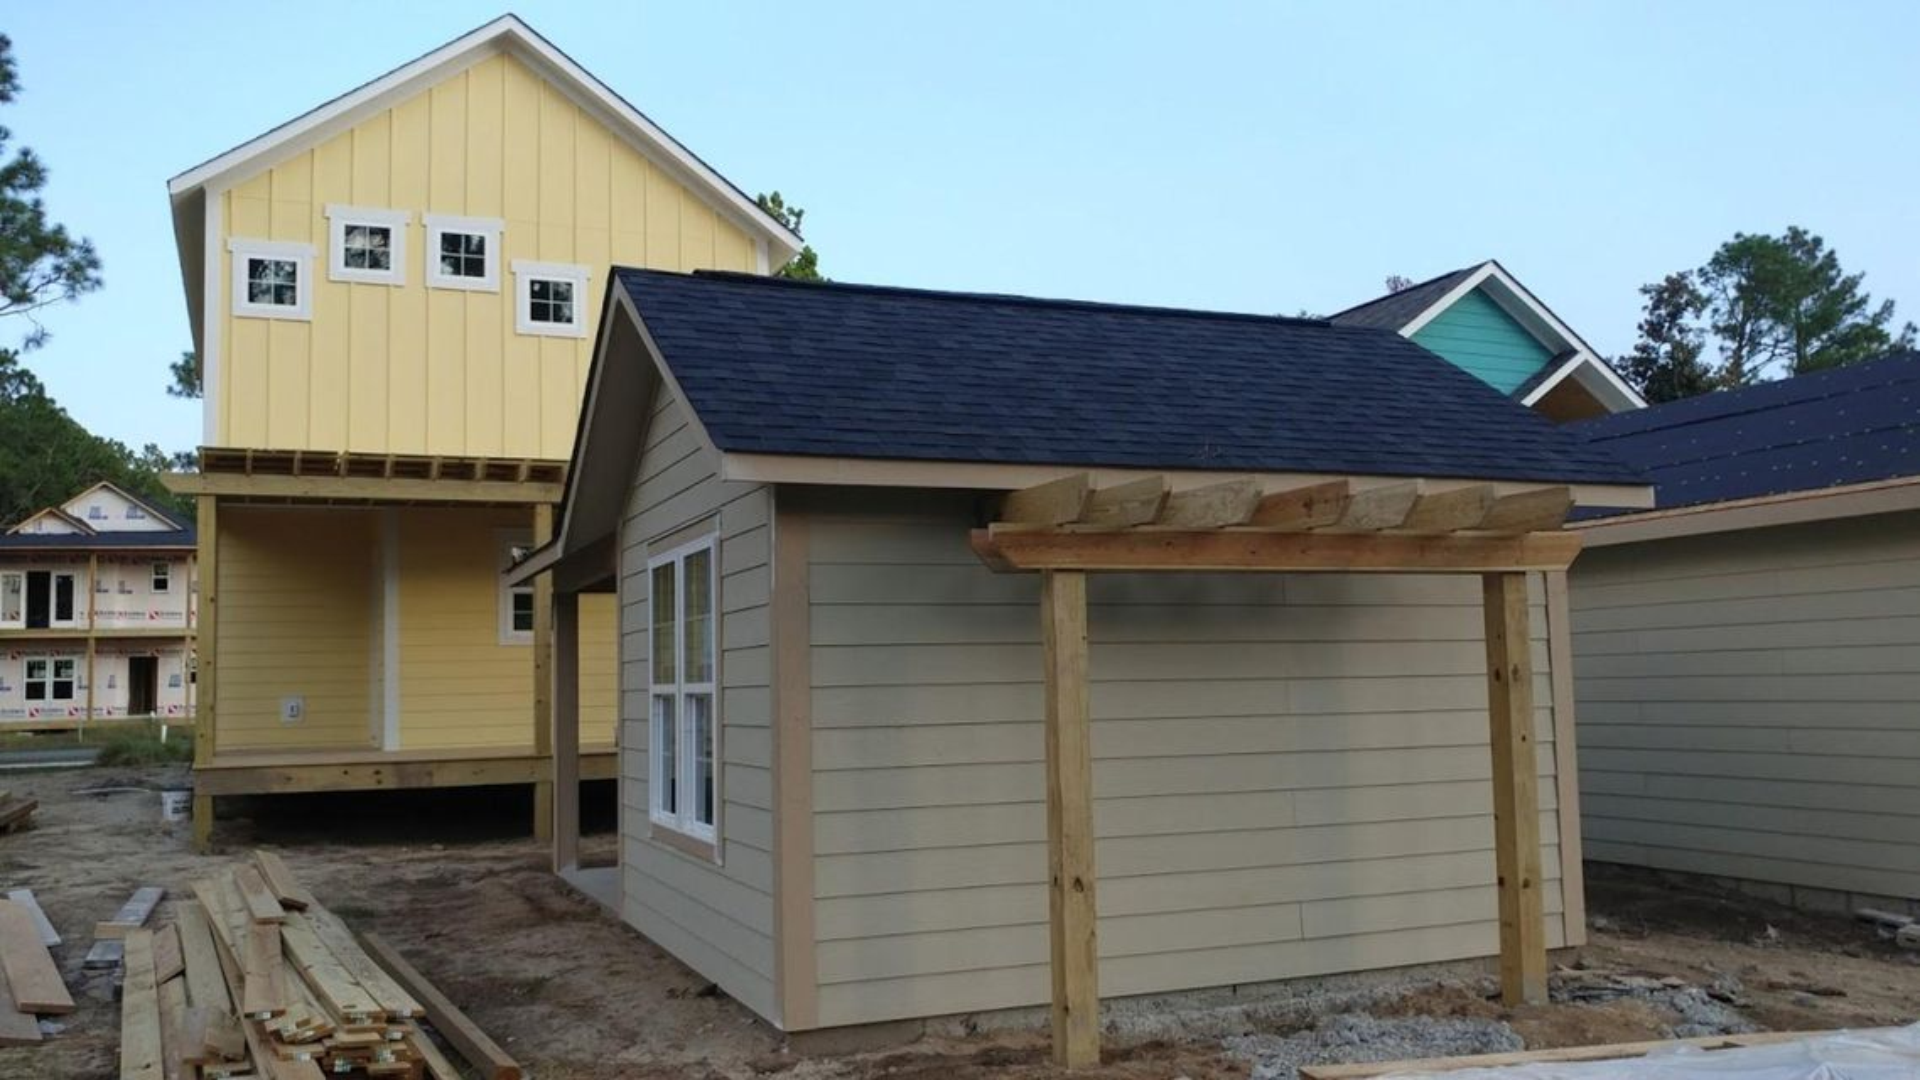 1404 Maplewood Dr Unit 1404 Green Acres, FL 33415 - MLS #: A10329686